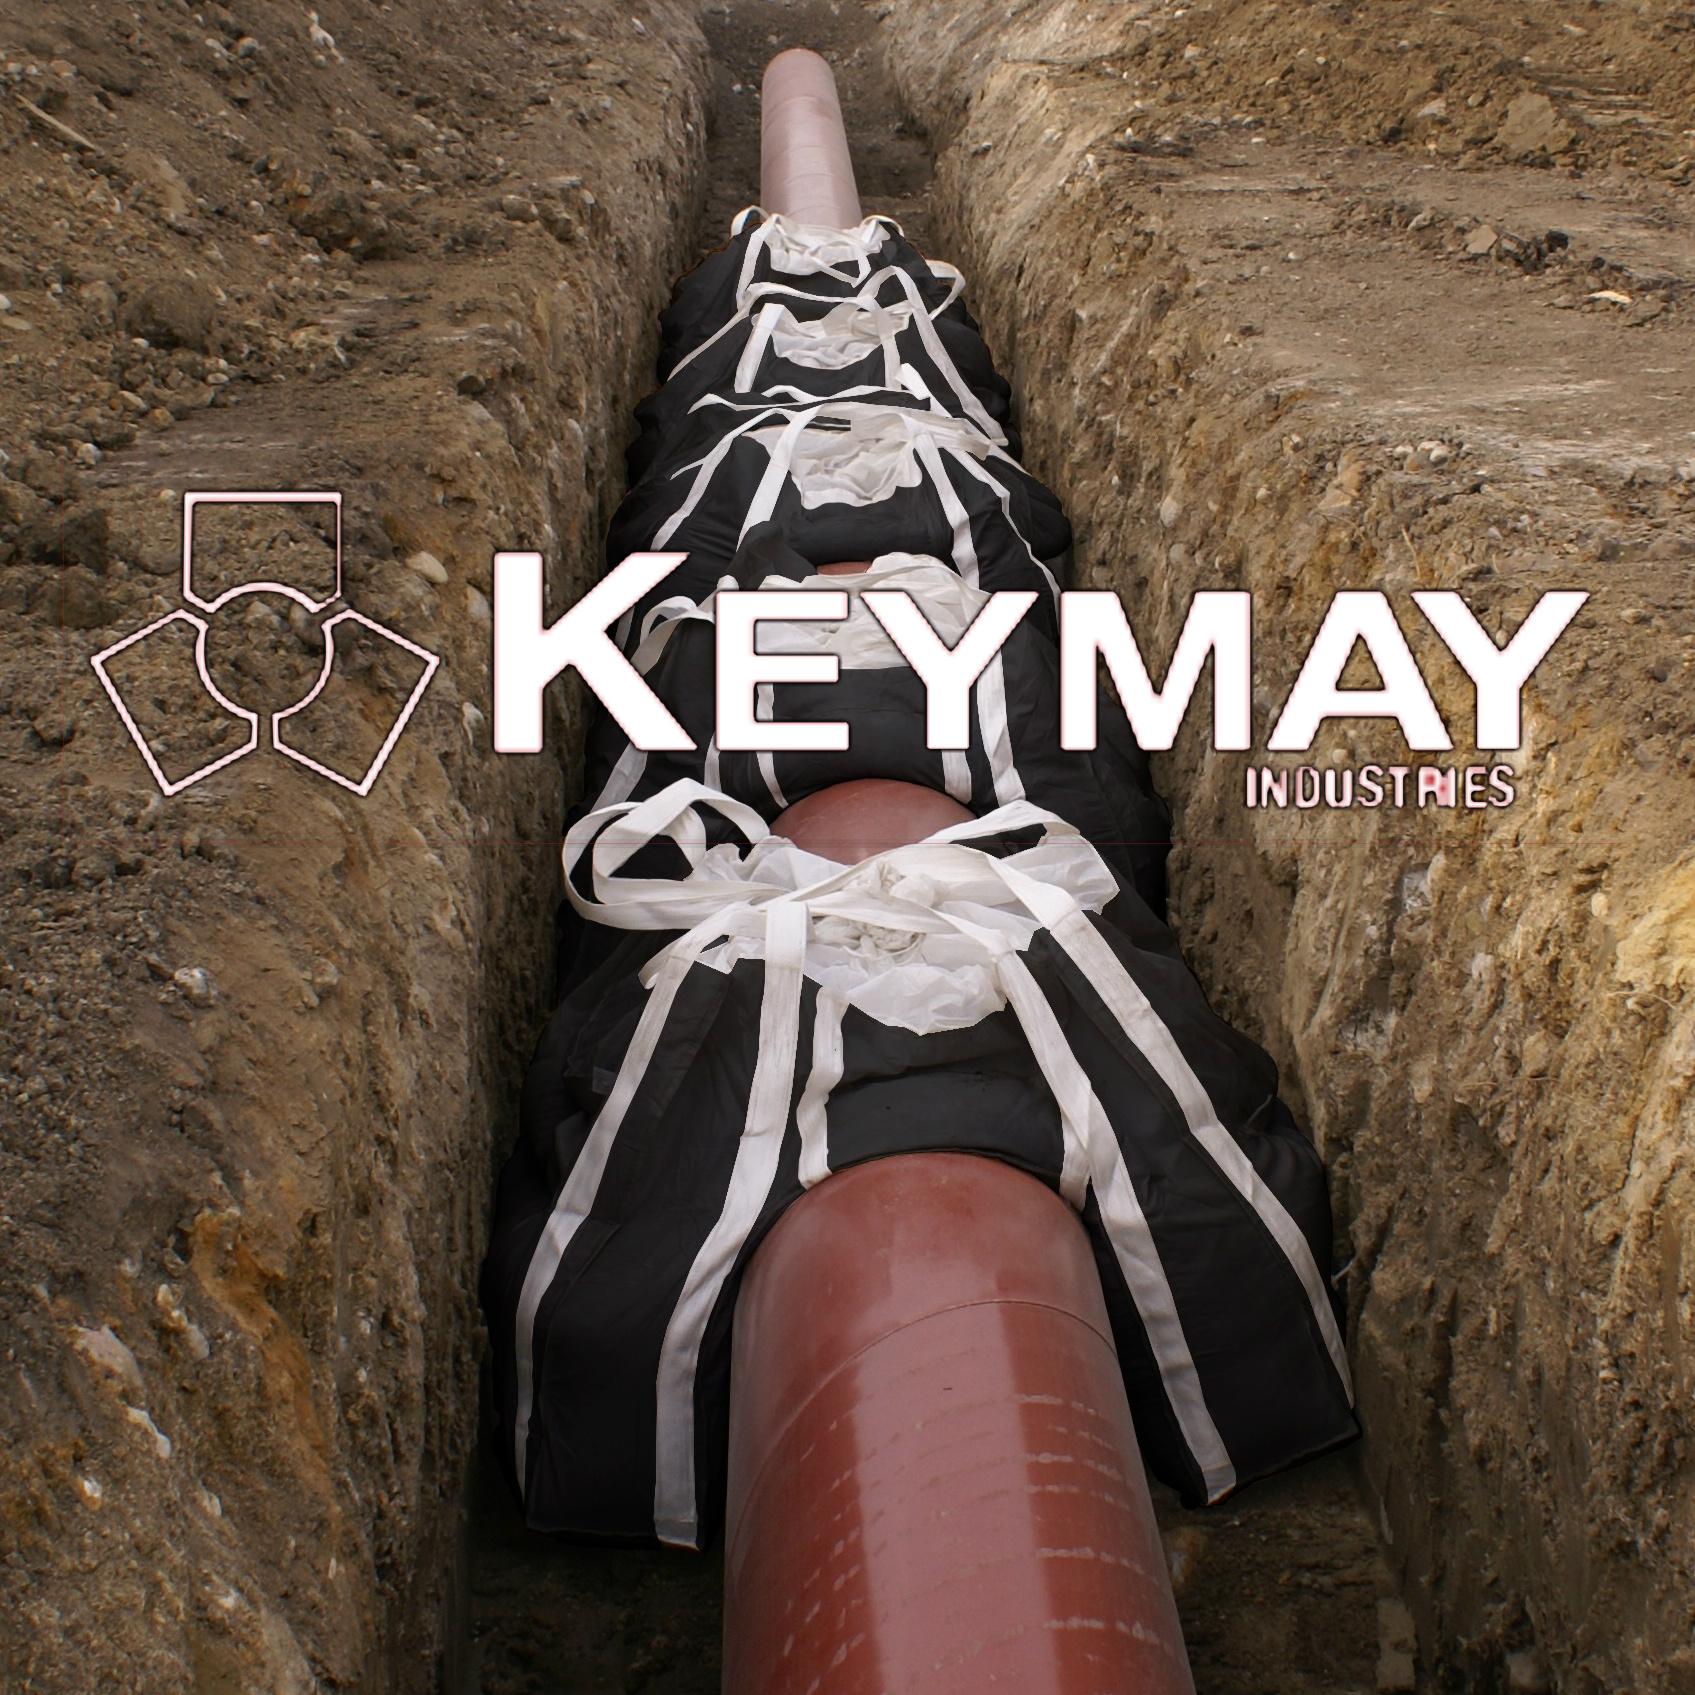 keymay-with-bg.jpg